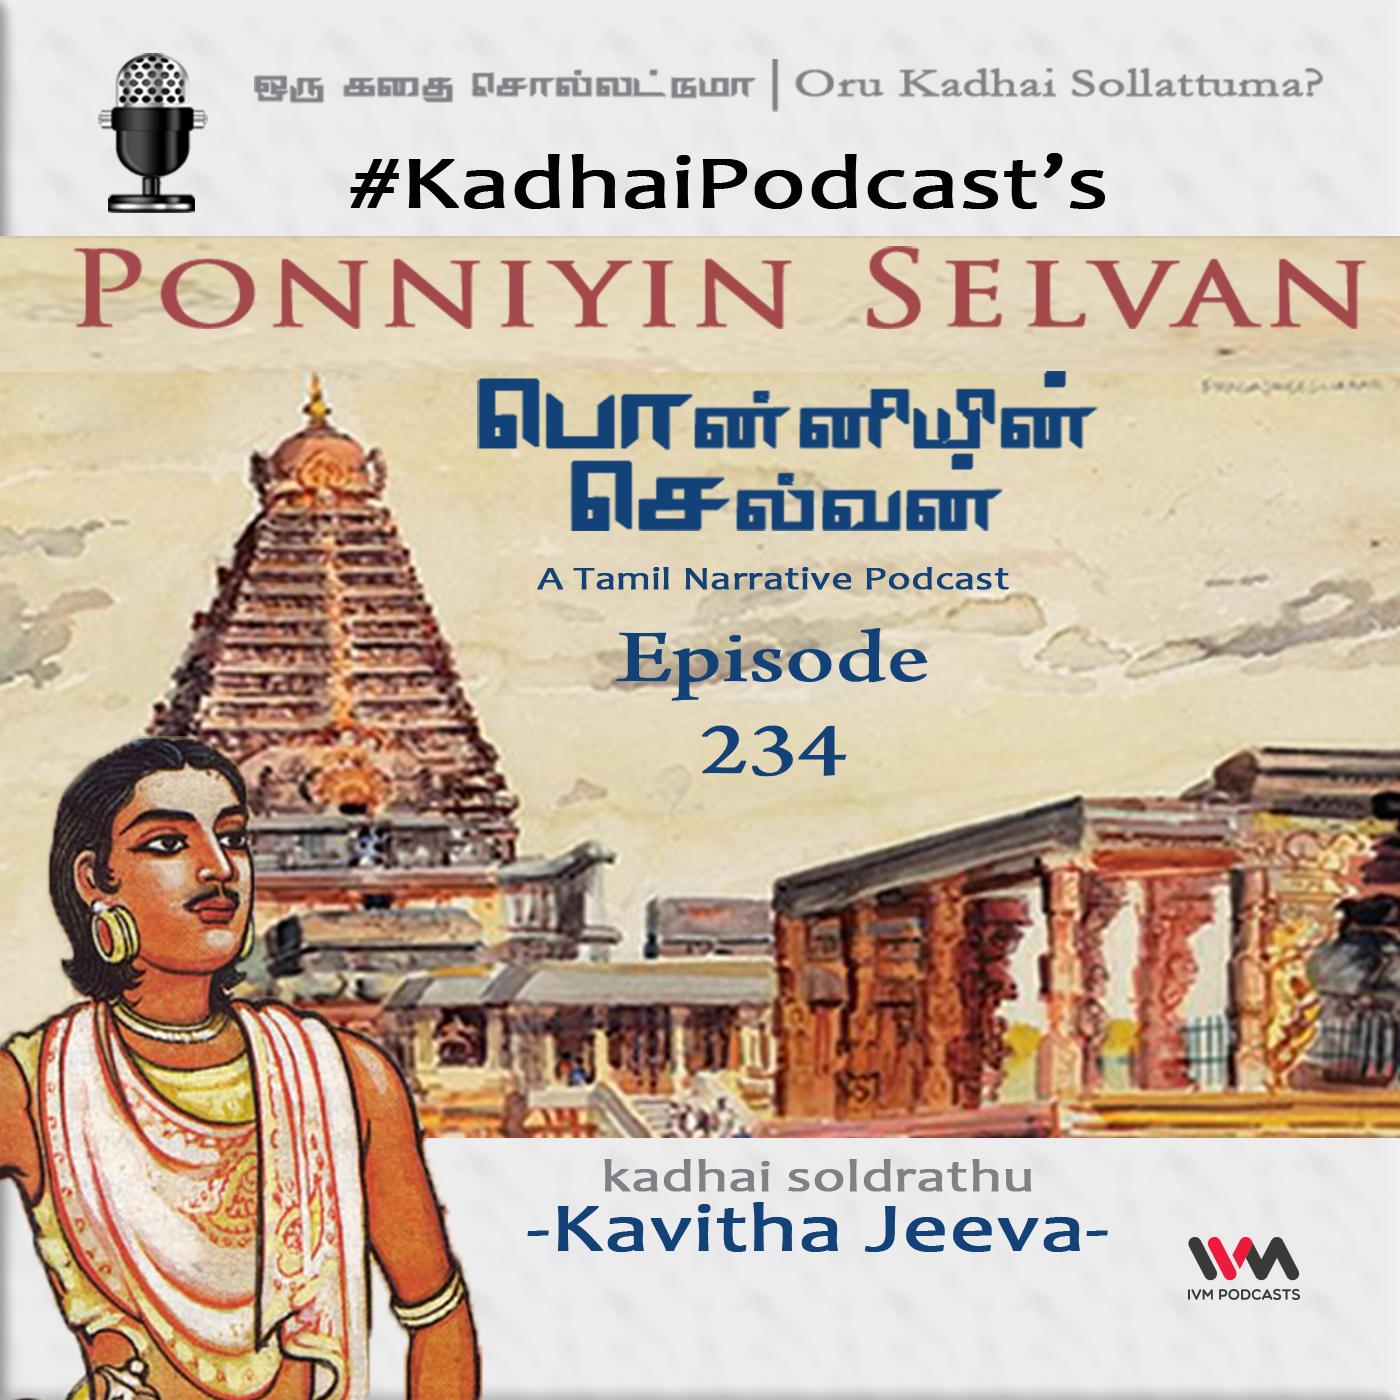 KadhaiPodcast's Ponniyin Selvan - Episode # 234